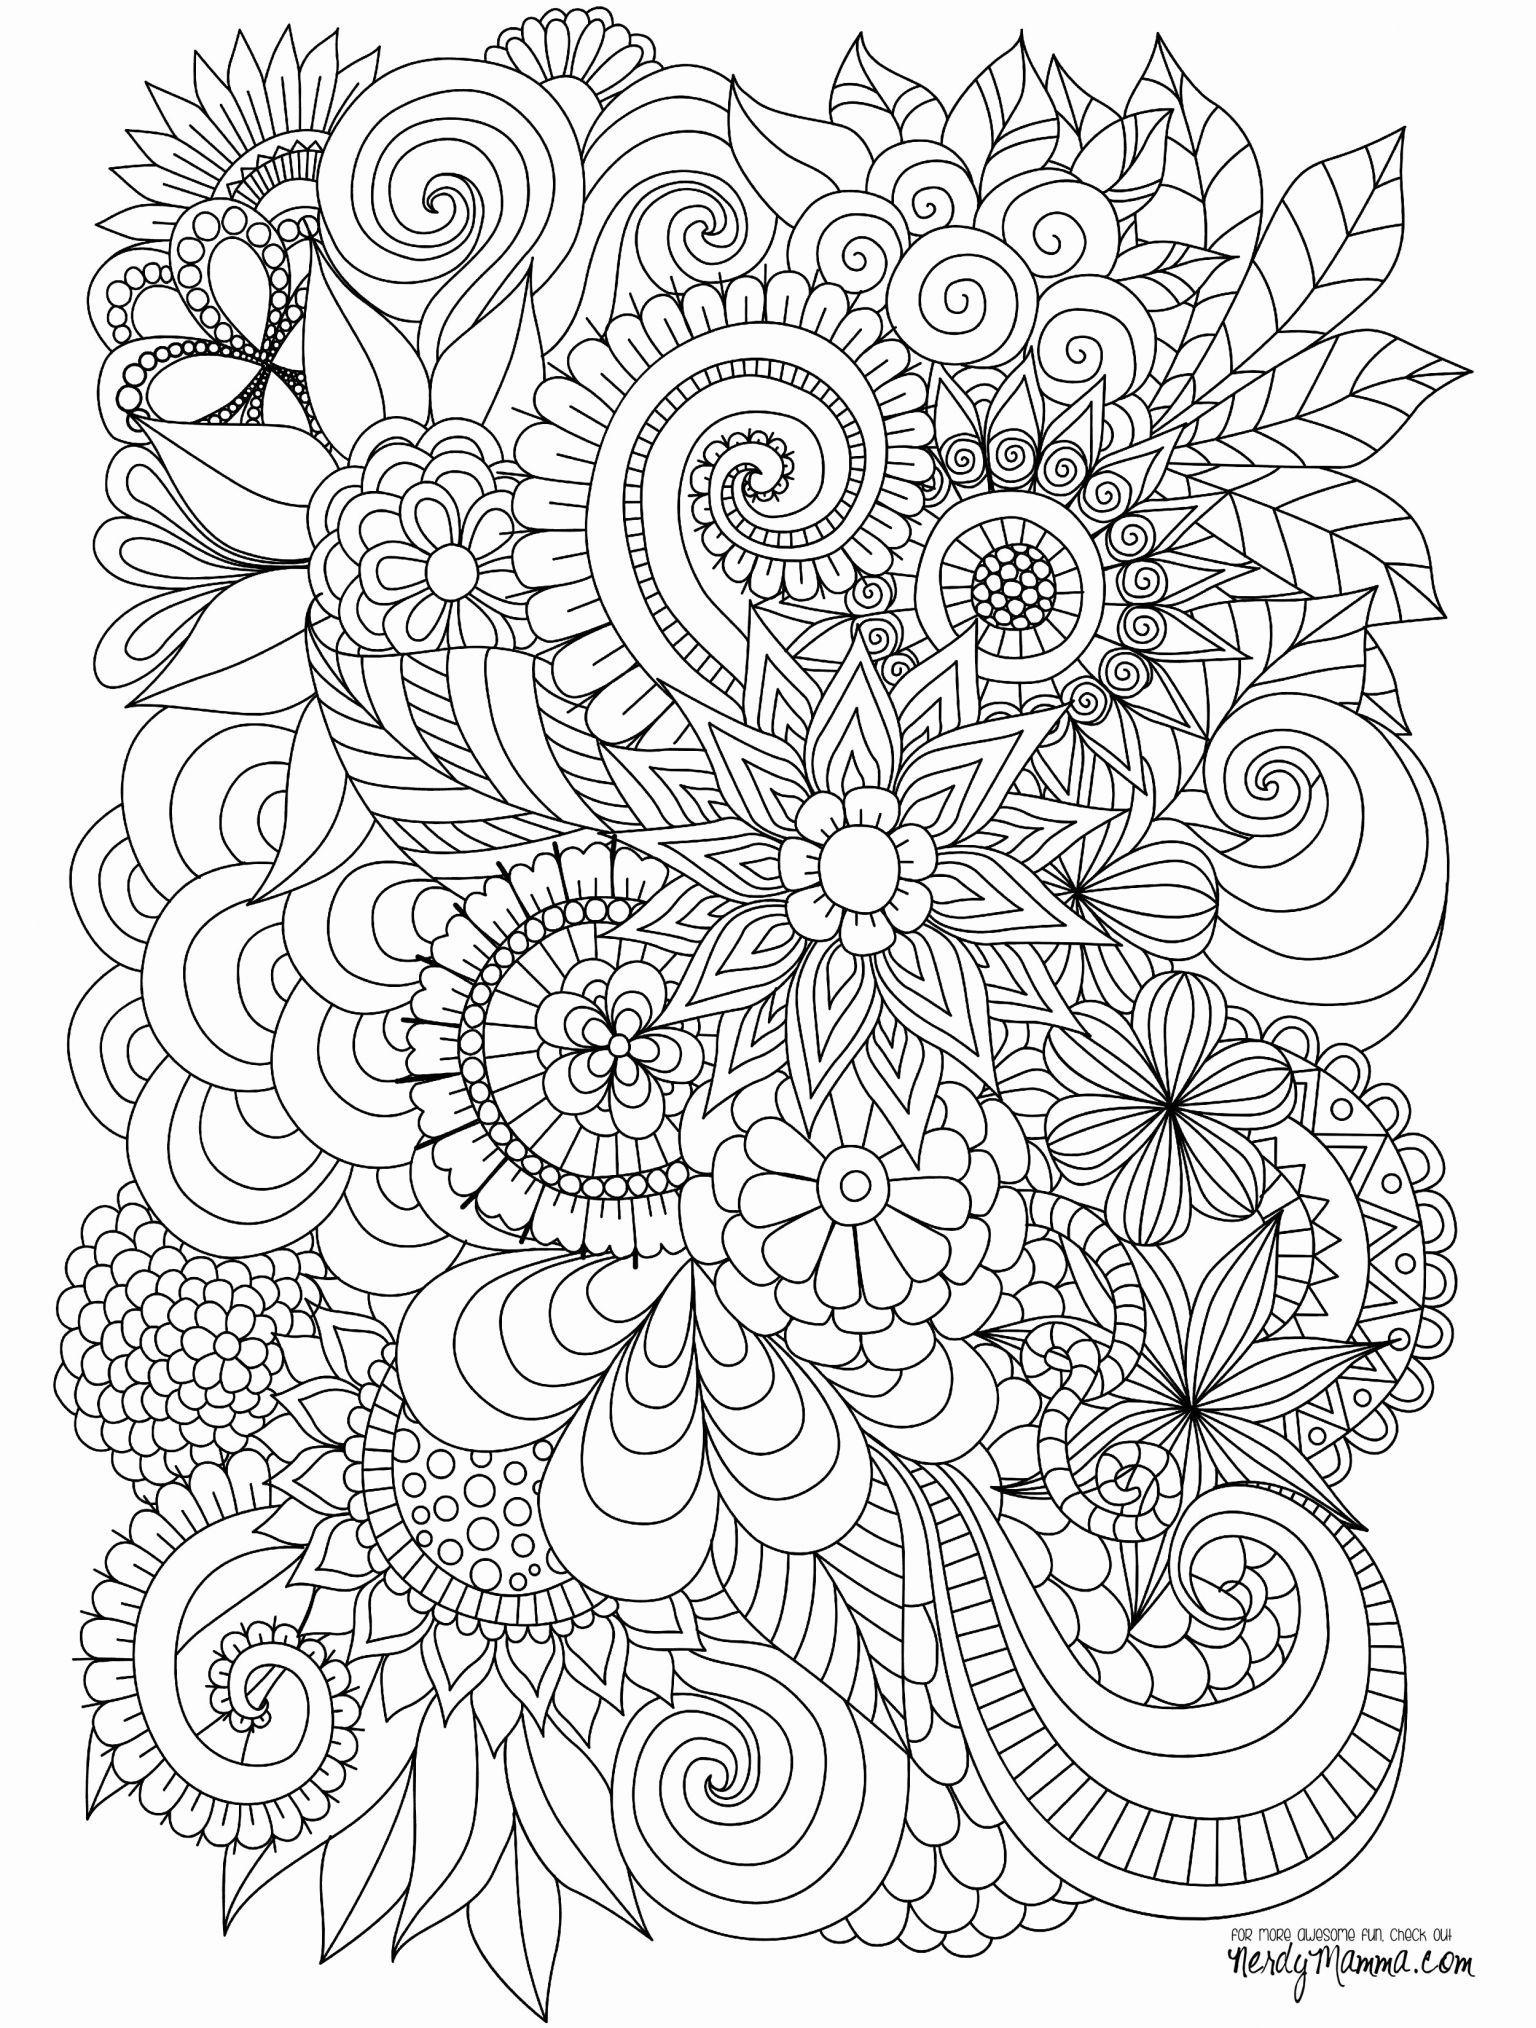 Falling Leaves Coloring Pages Fall Coloring Pages For Adults Printable Beautiful Best Coloring Mandalas Para Colorear Mandalas Animales Libros Para Colorear